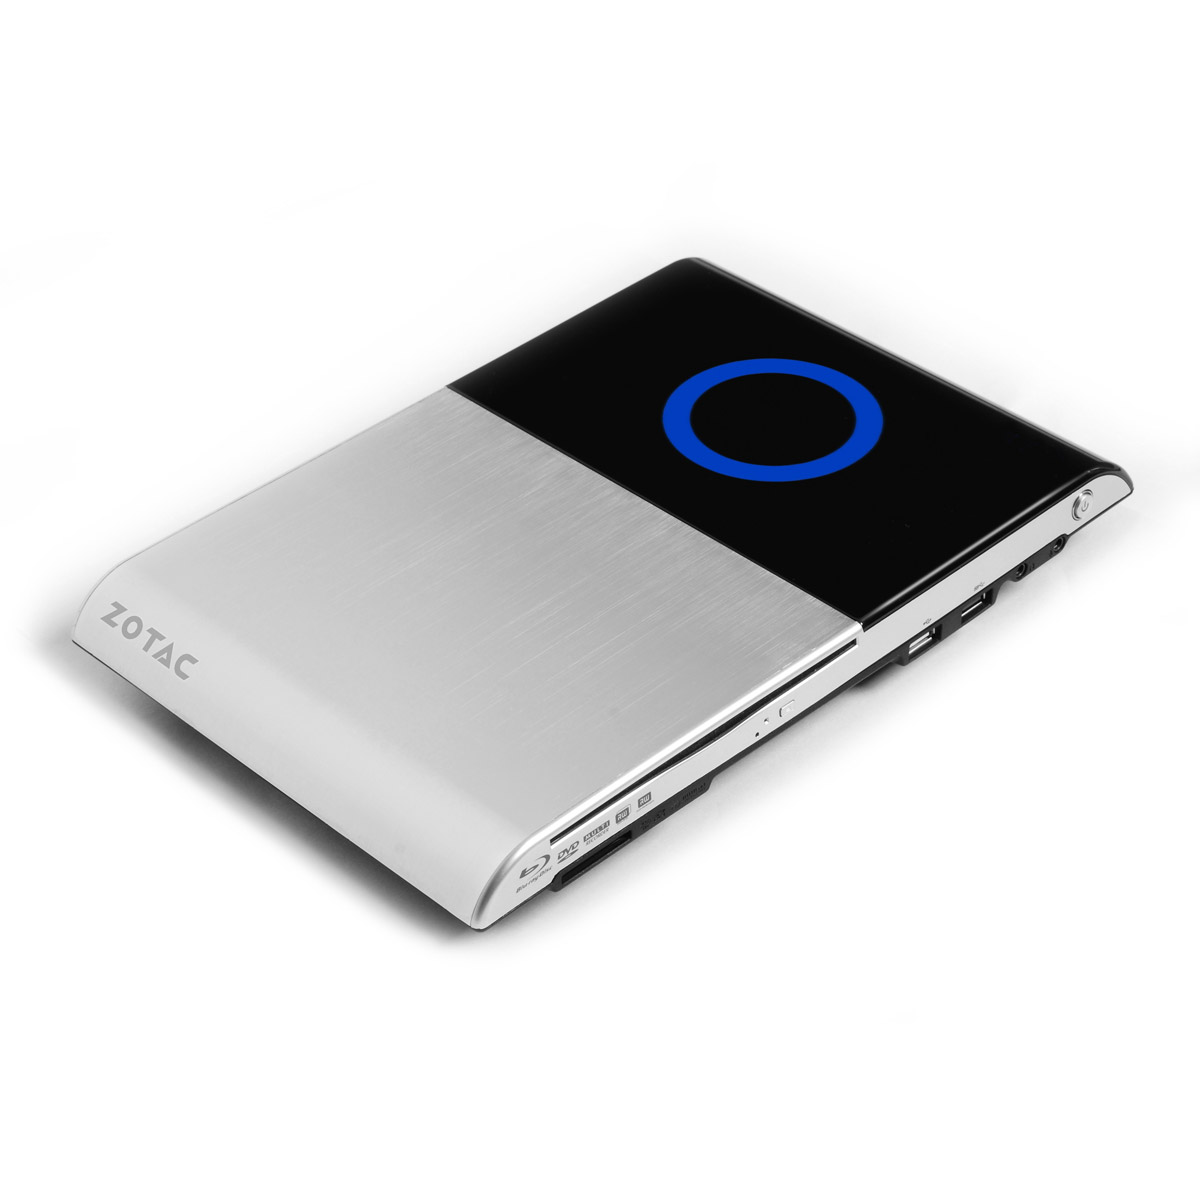 Barebone PC ZOTAC ZBOX AD03BR AMD E350 AMD Radeon HD 6310 Lecteur Blu-ray Wi-Fi N (sans écran/mémoire/disque dur)